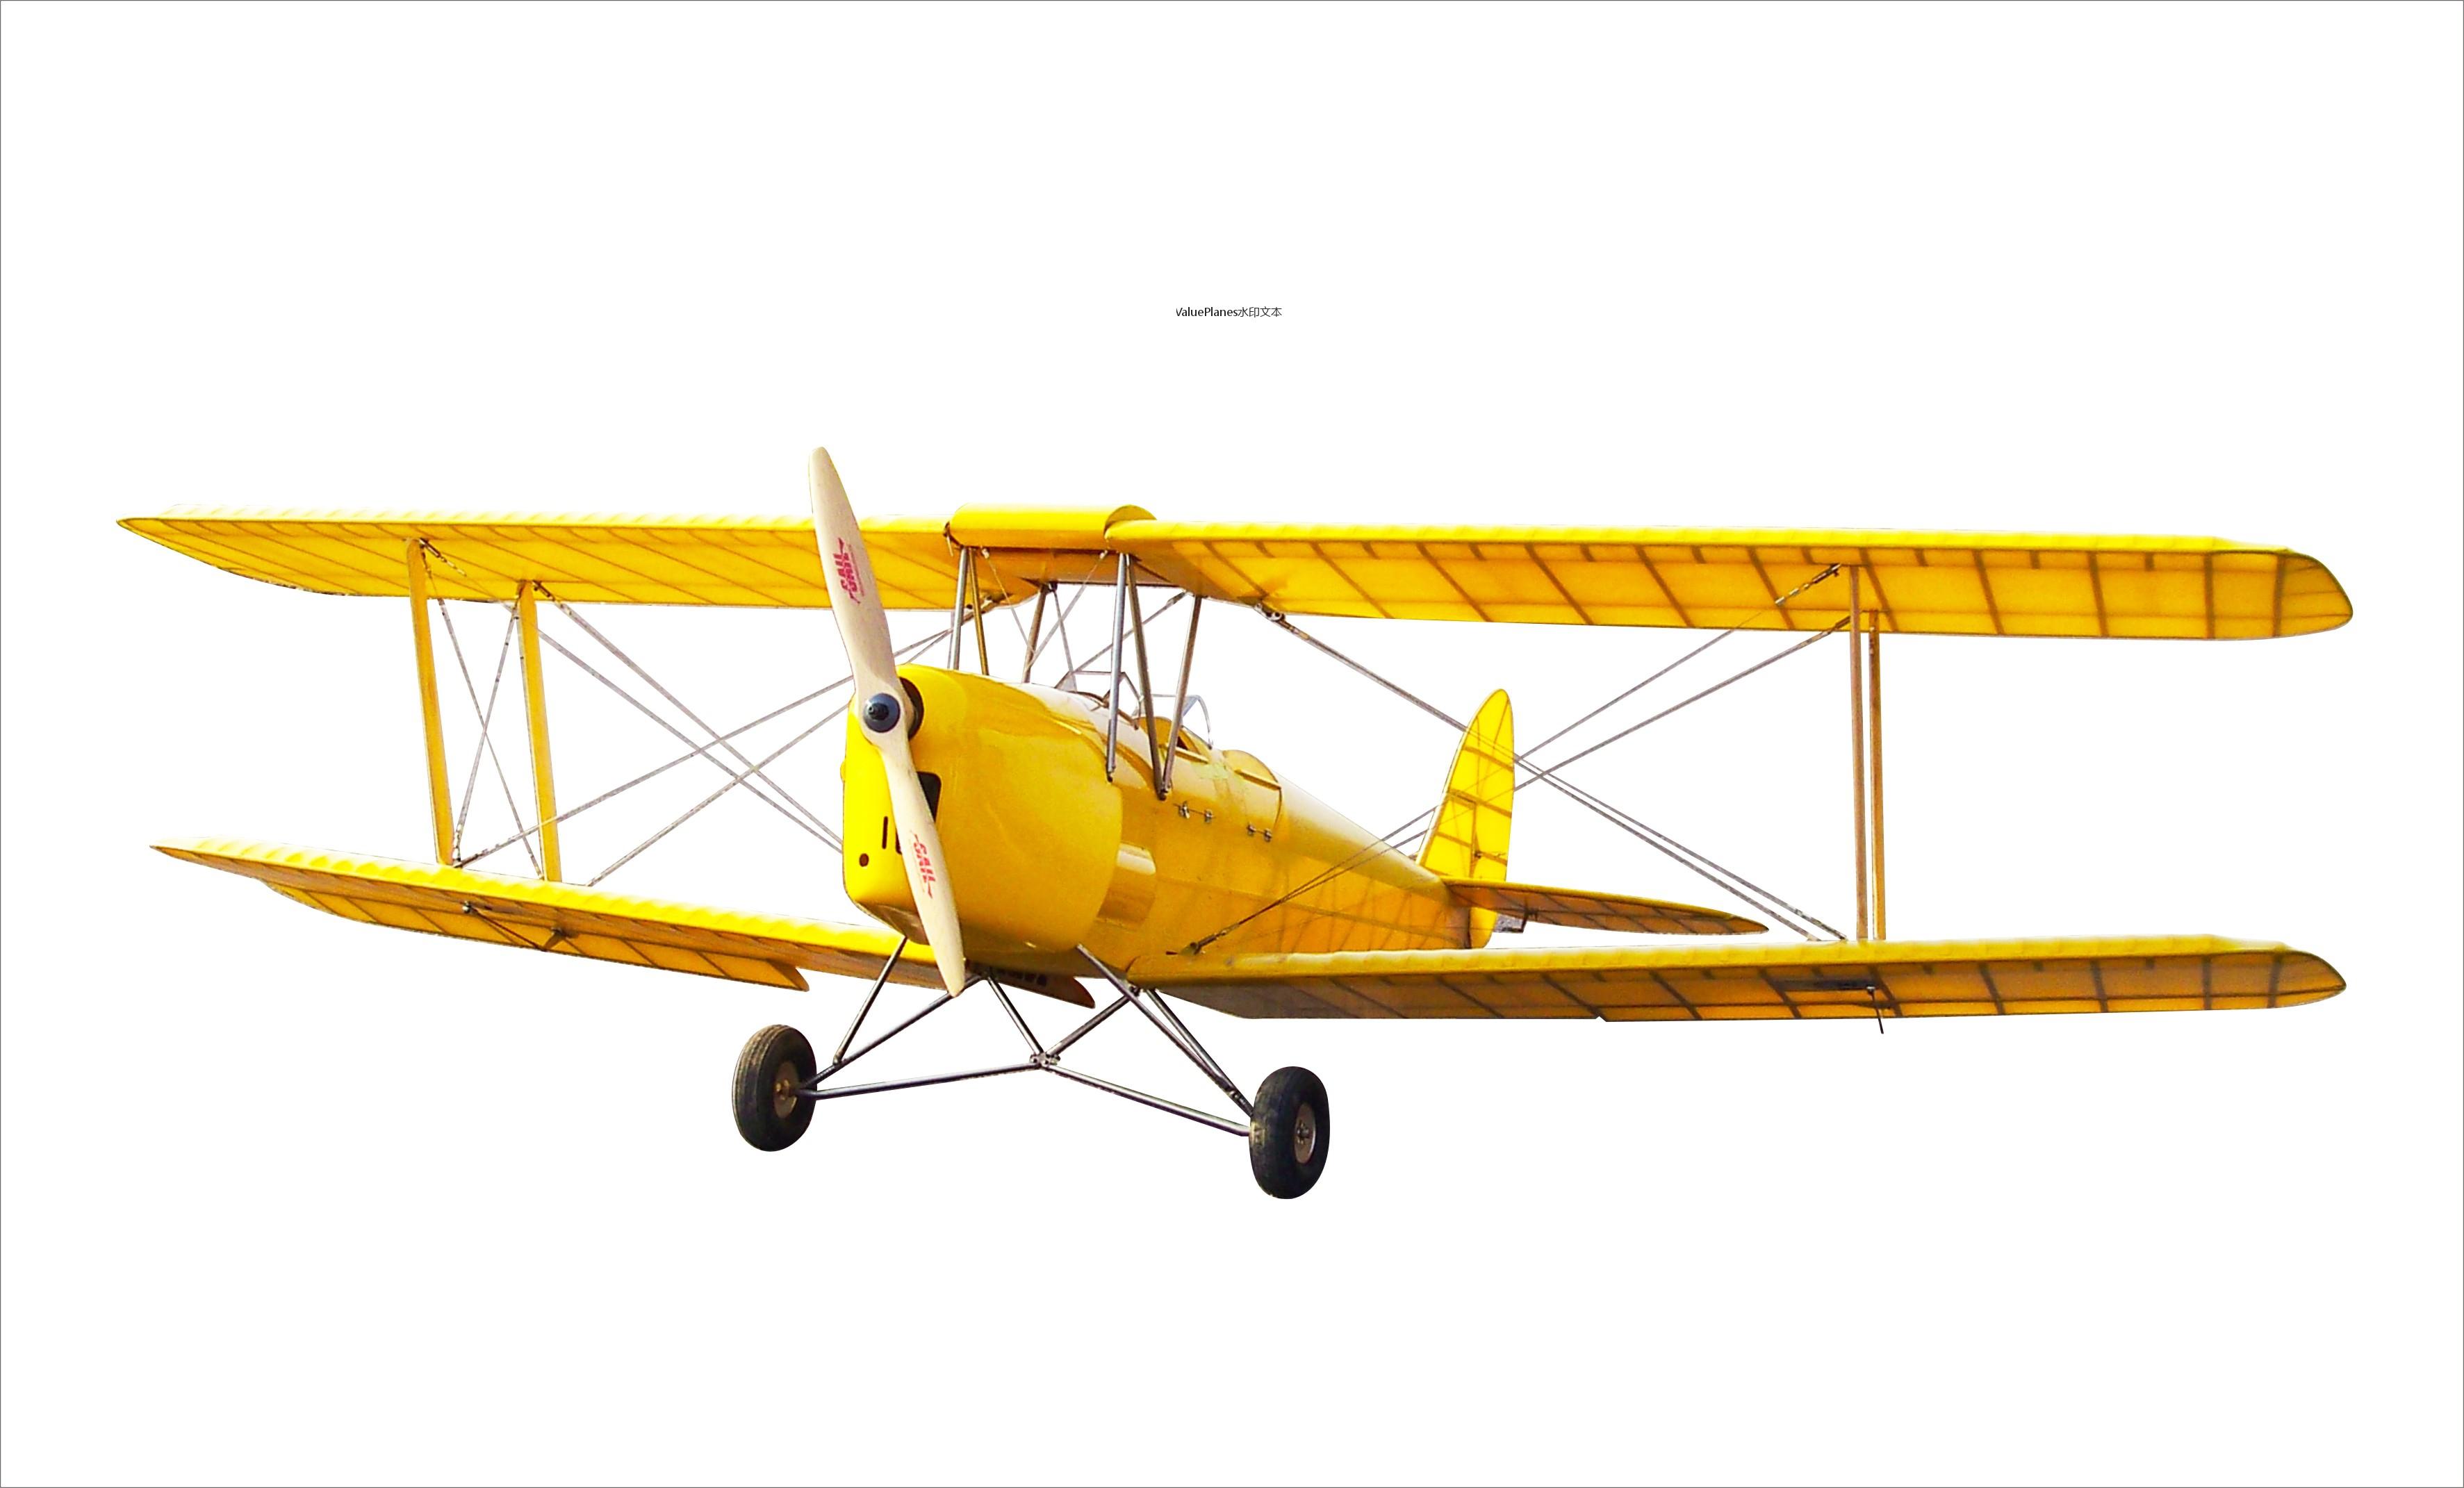 1:3.8 De Haviland DH82a Tiger Moth